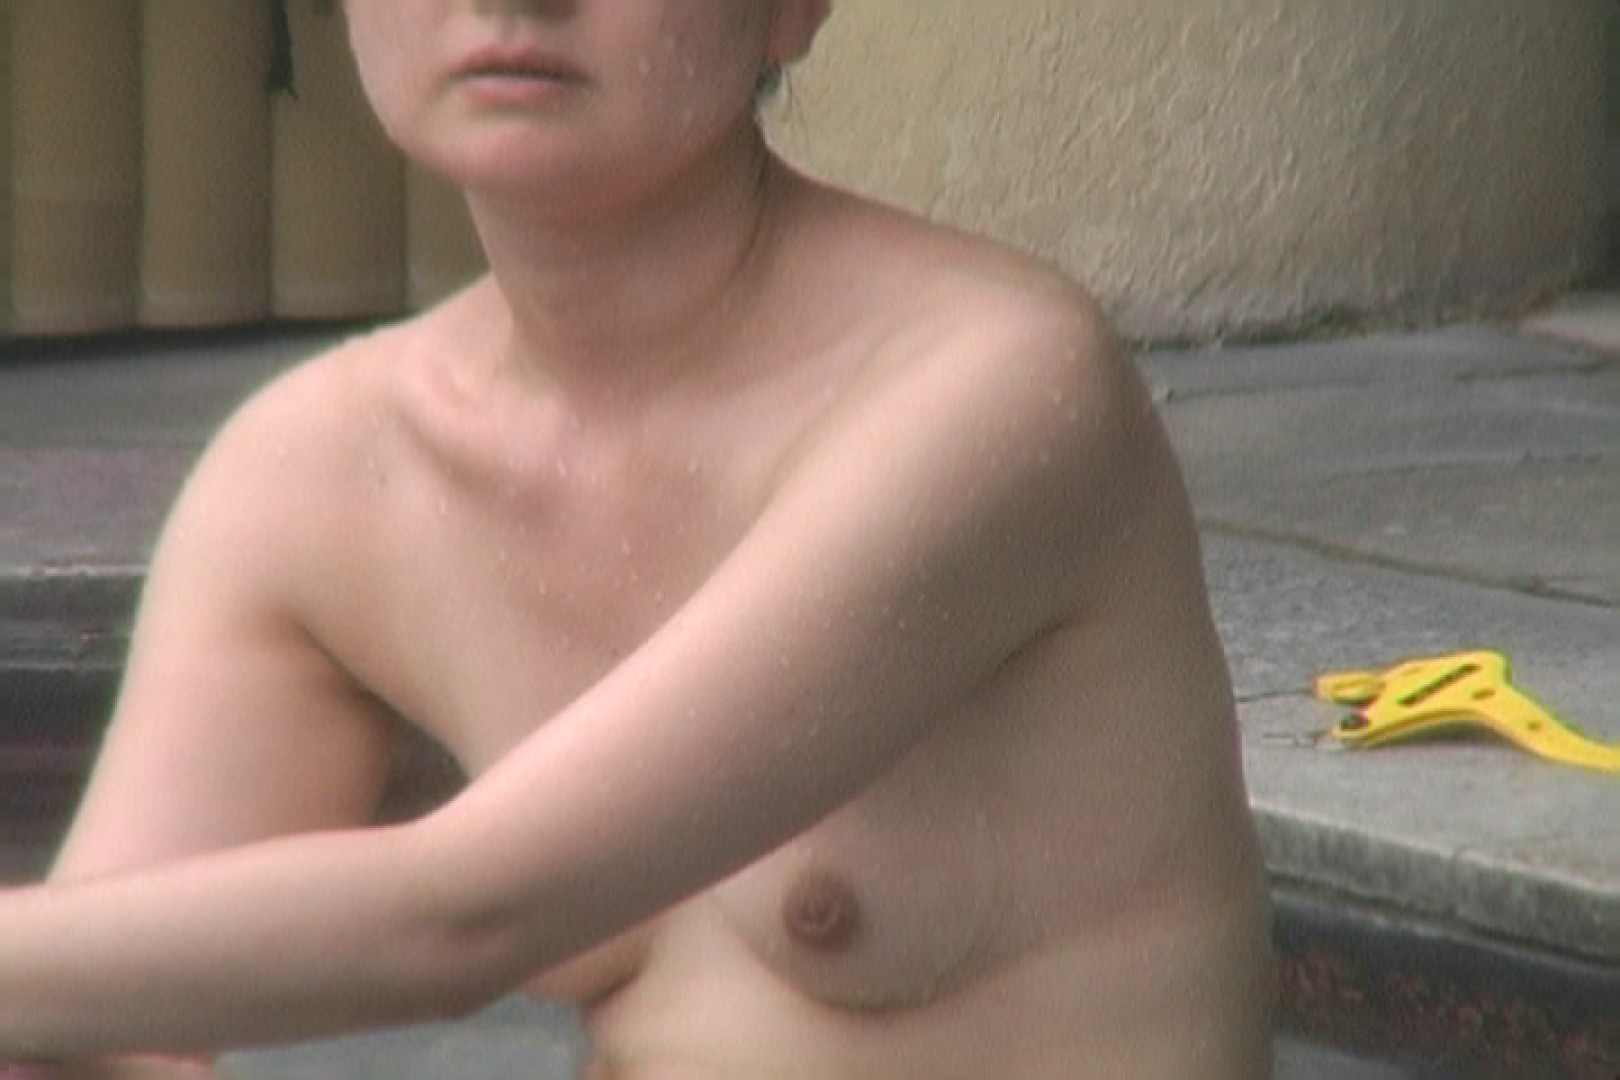 Aquaな露天風呂Vol.640 エッチな盗撮 セックス画像 101pic 82